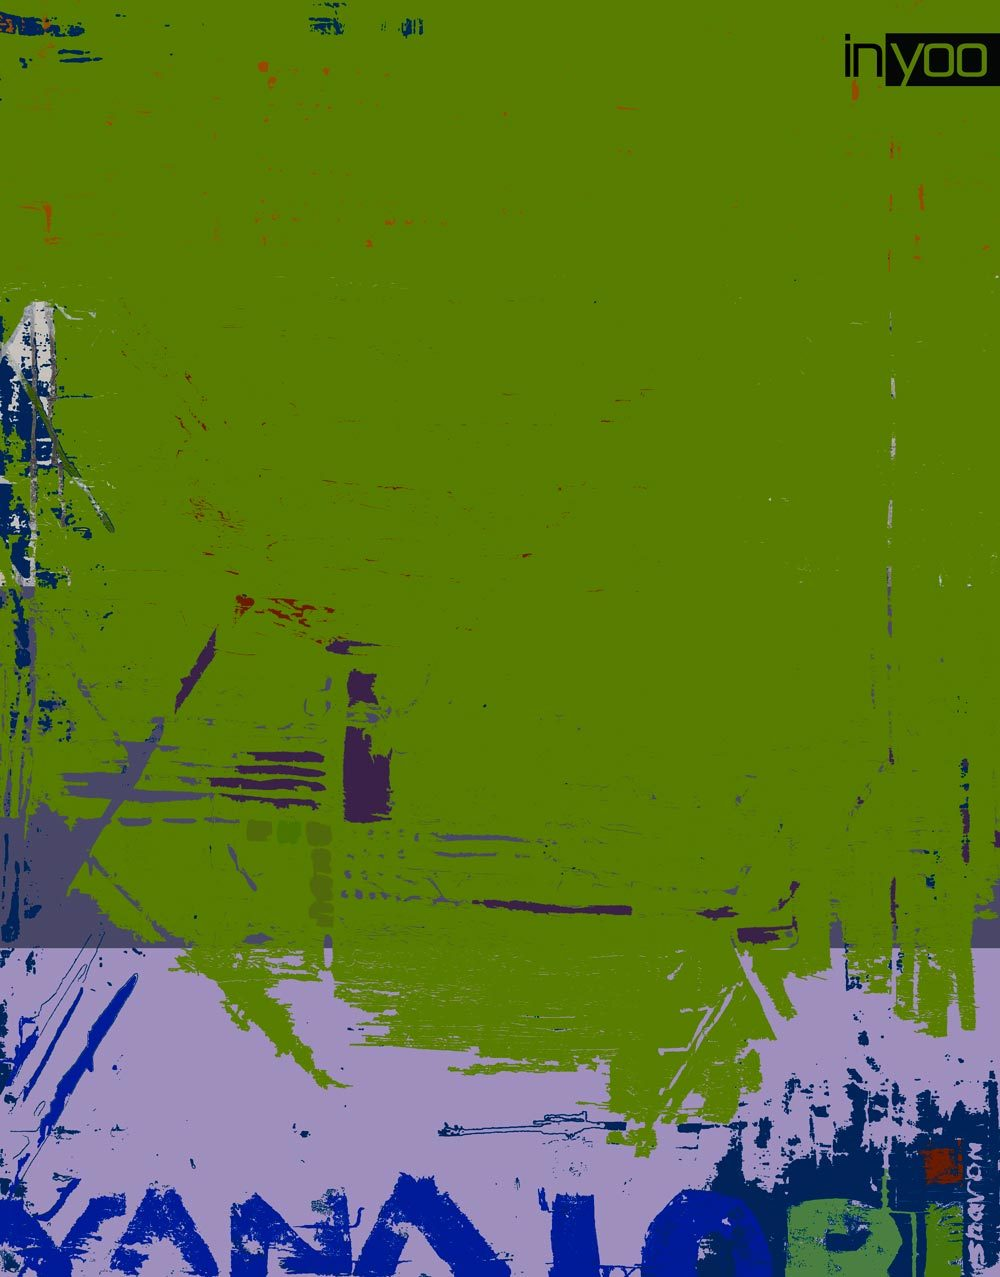 colorful-plaster- עבודה אבסטרקטית צבעונית מיצירותיה של המעצבת שרון גולן